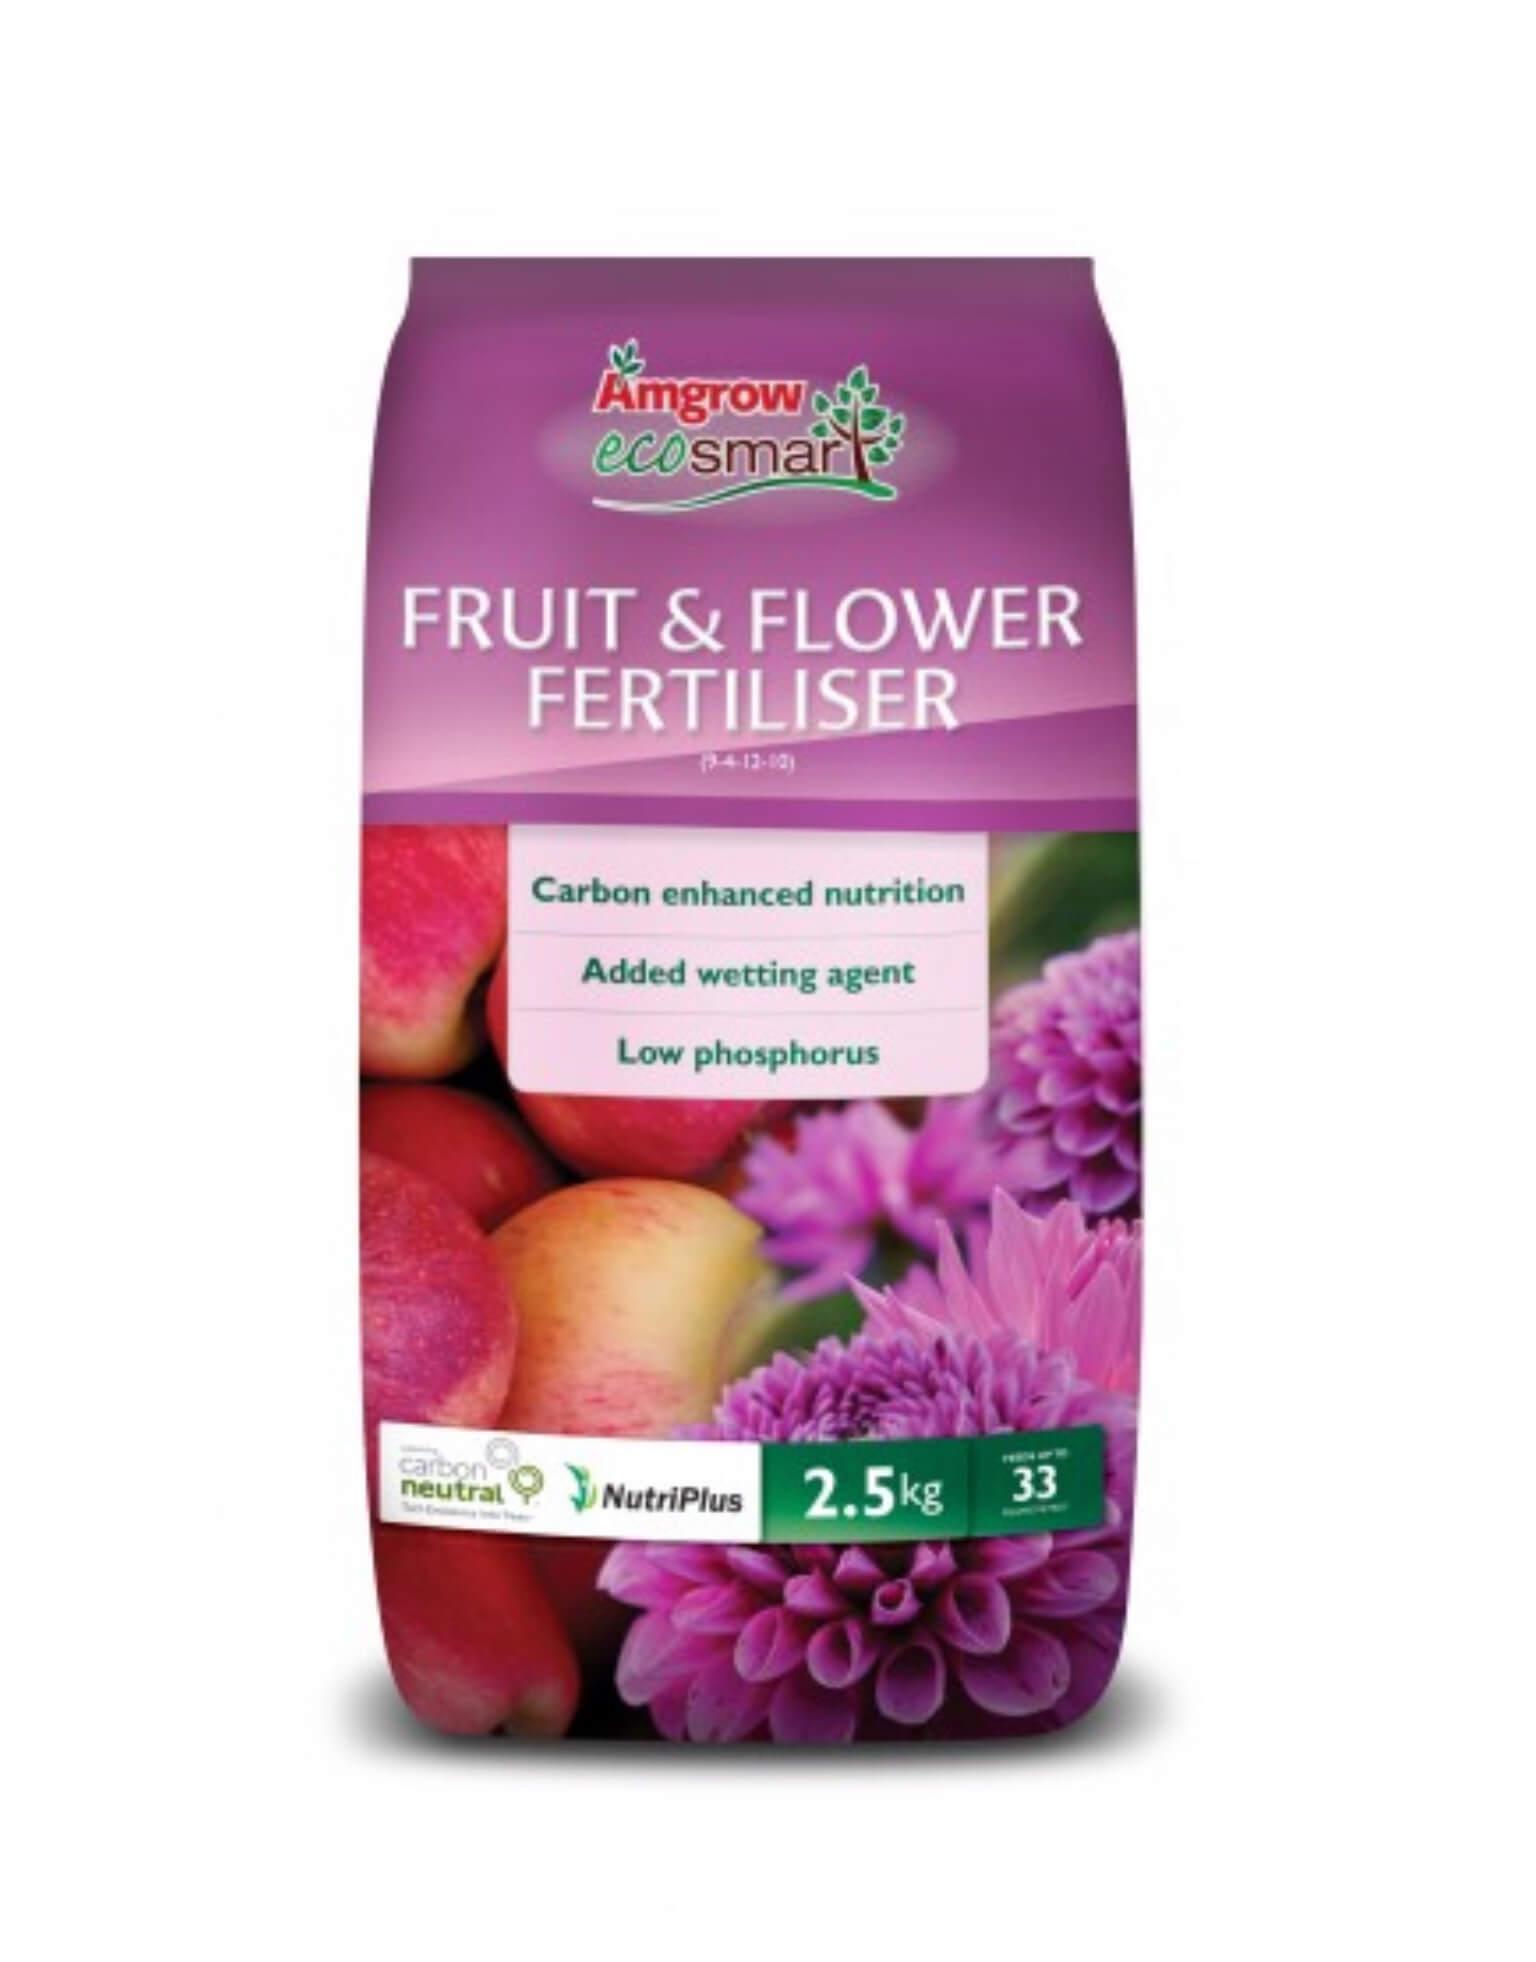 Amgrow ecosmart fruit & flower fertiliser 2.5kg